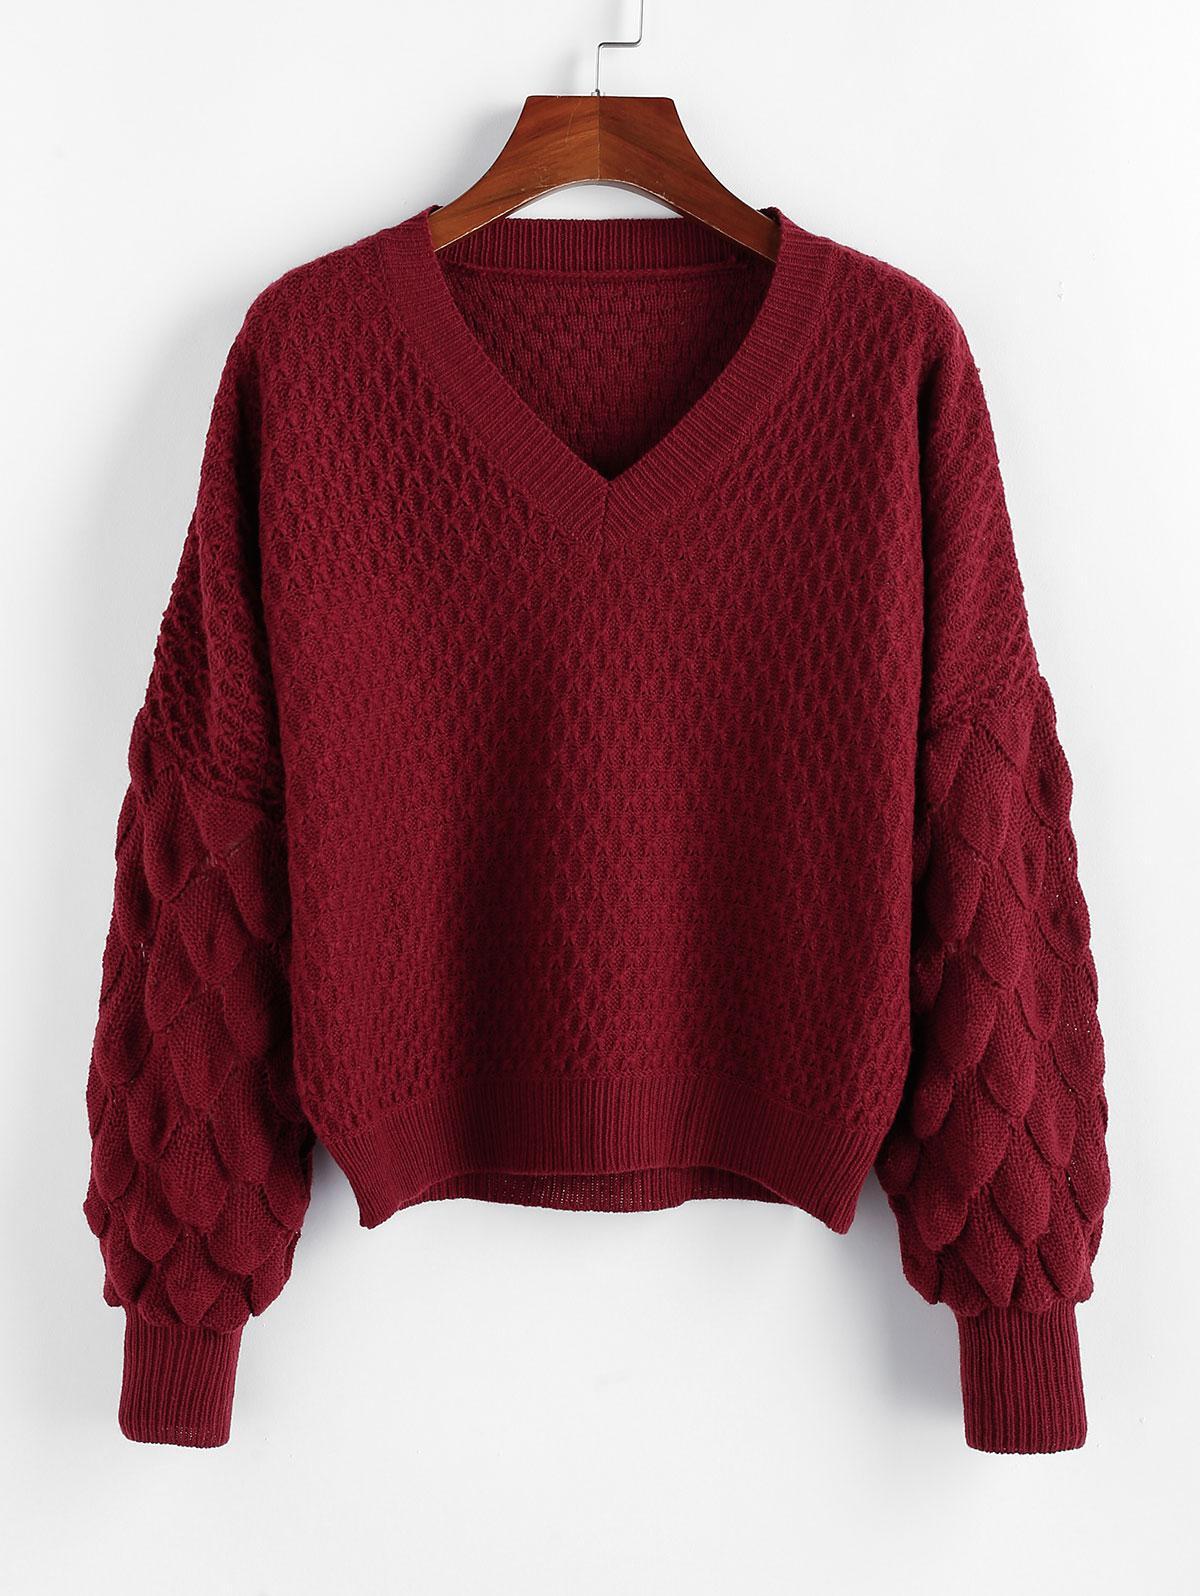 ZAFUL Fish Scale Knit Drop Shoulder V Neck Sweater